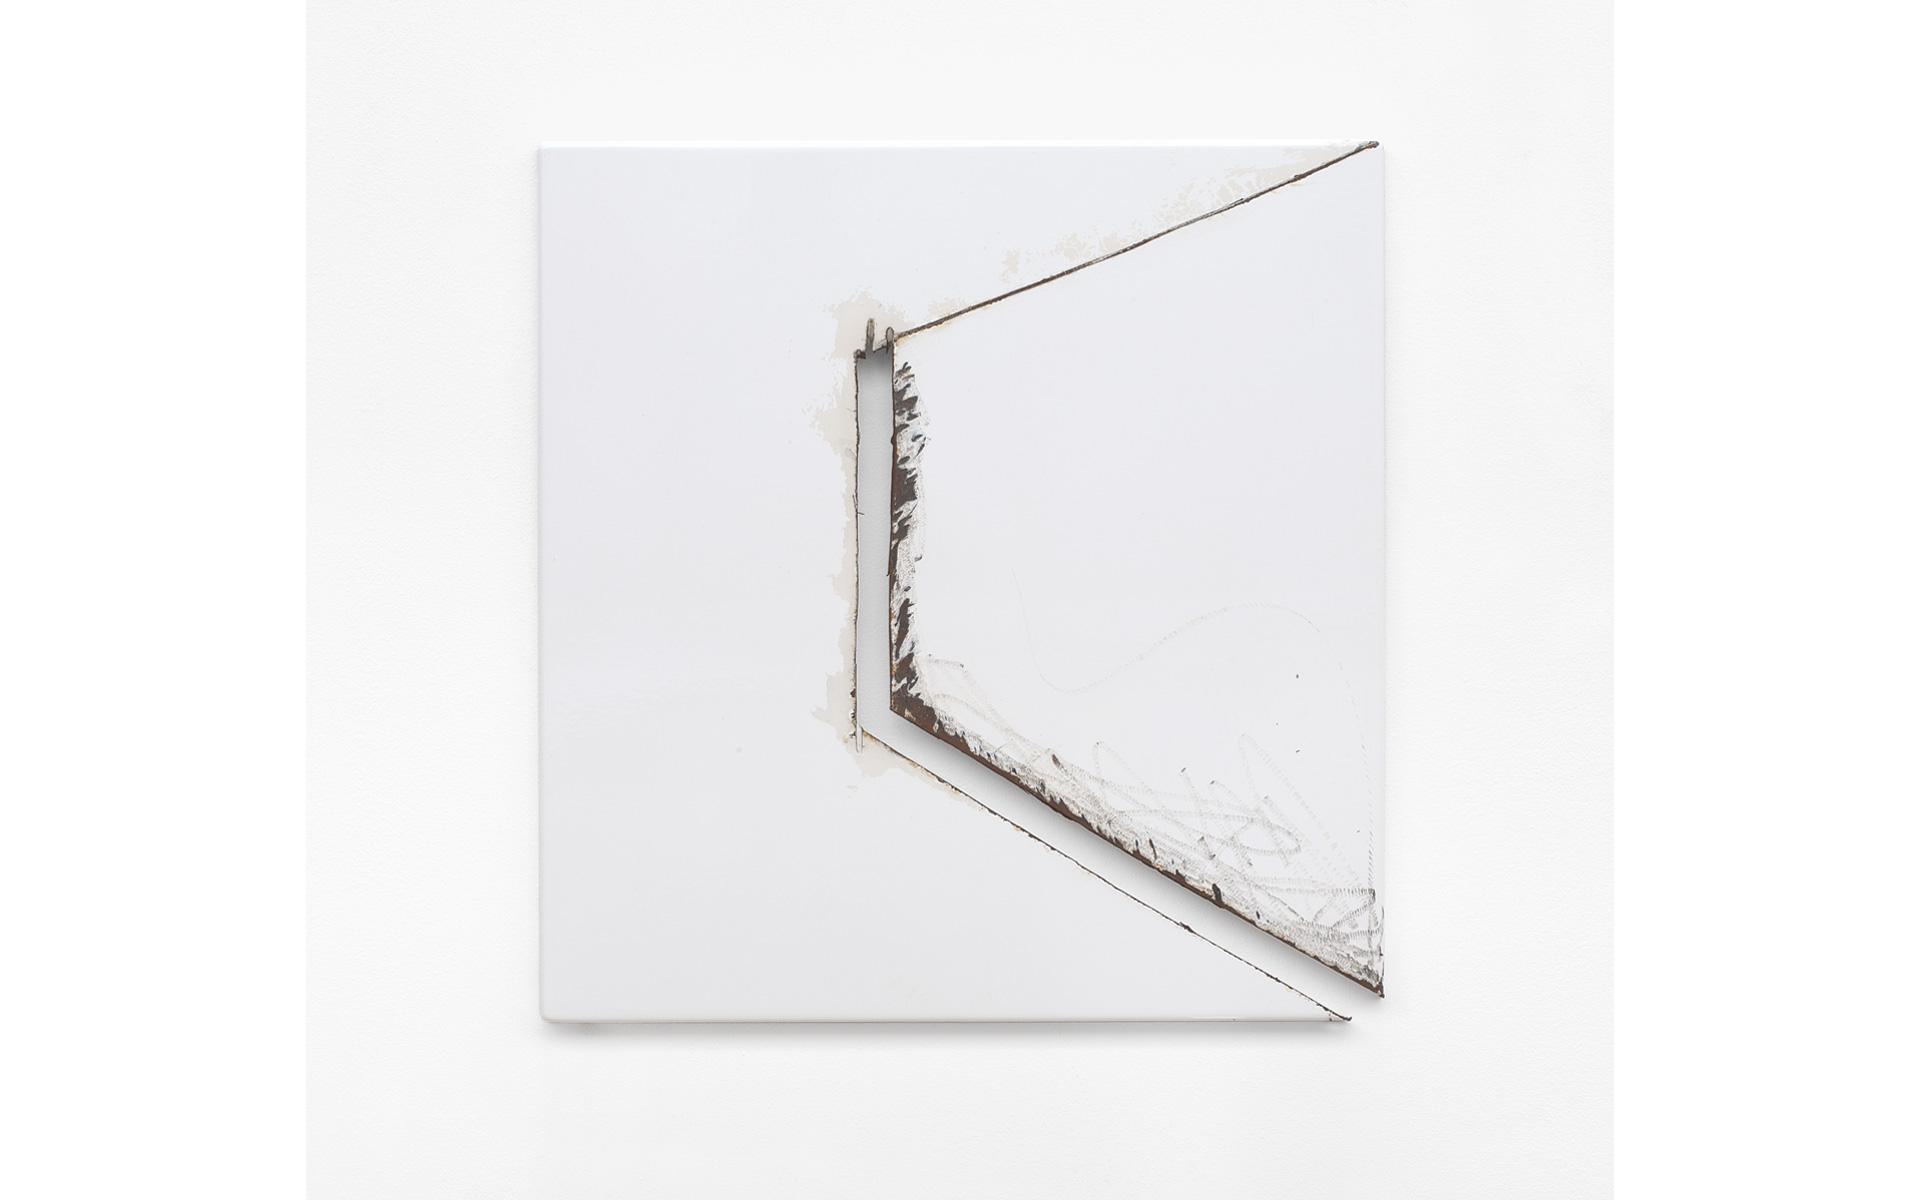 O. T., 1985 Steel enameled 56.2 × 53.7 × 2.5 cm - Photo: Christoph Valentien